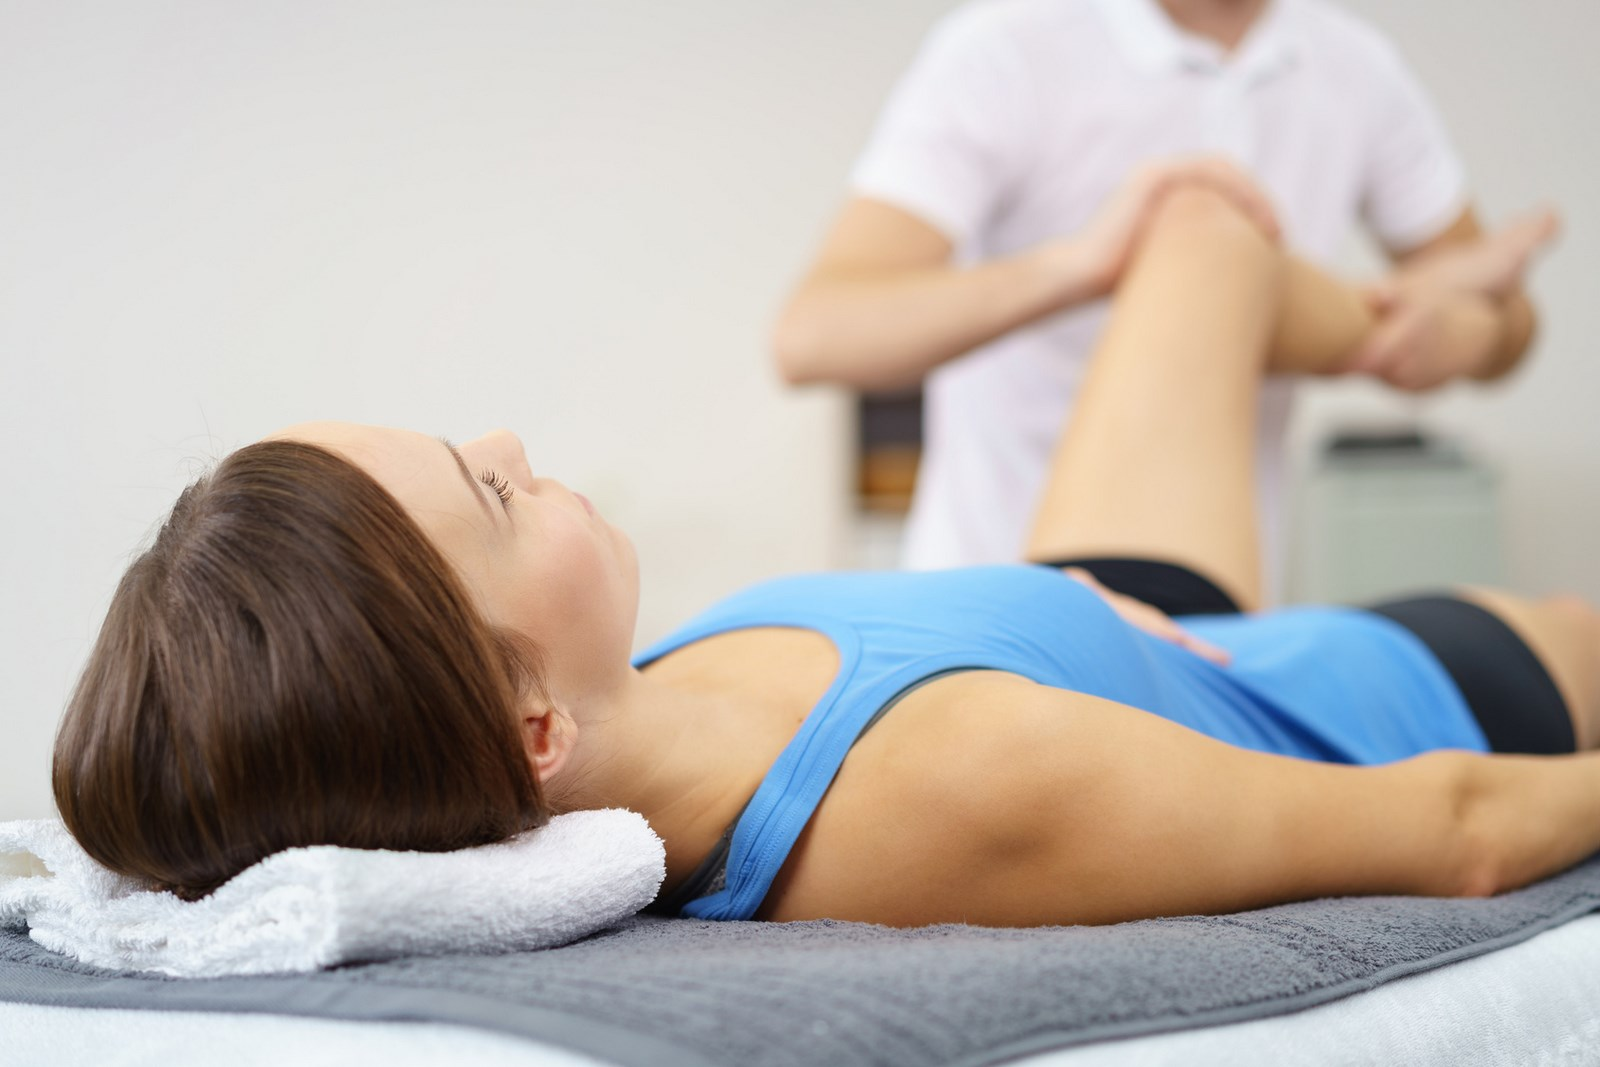 fisioterapia convenzionata a quartu sant